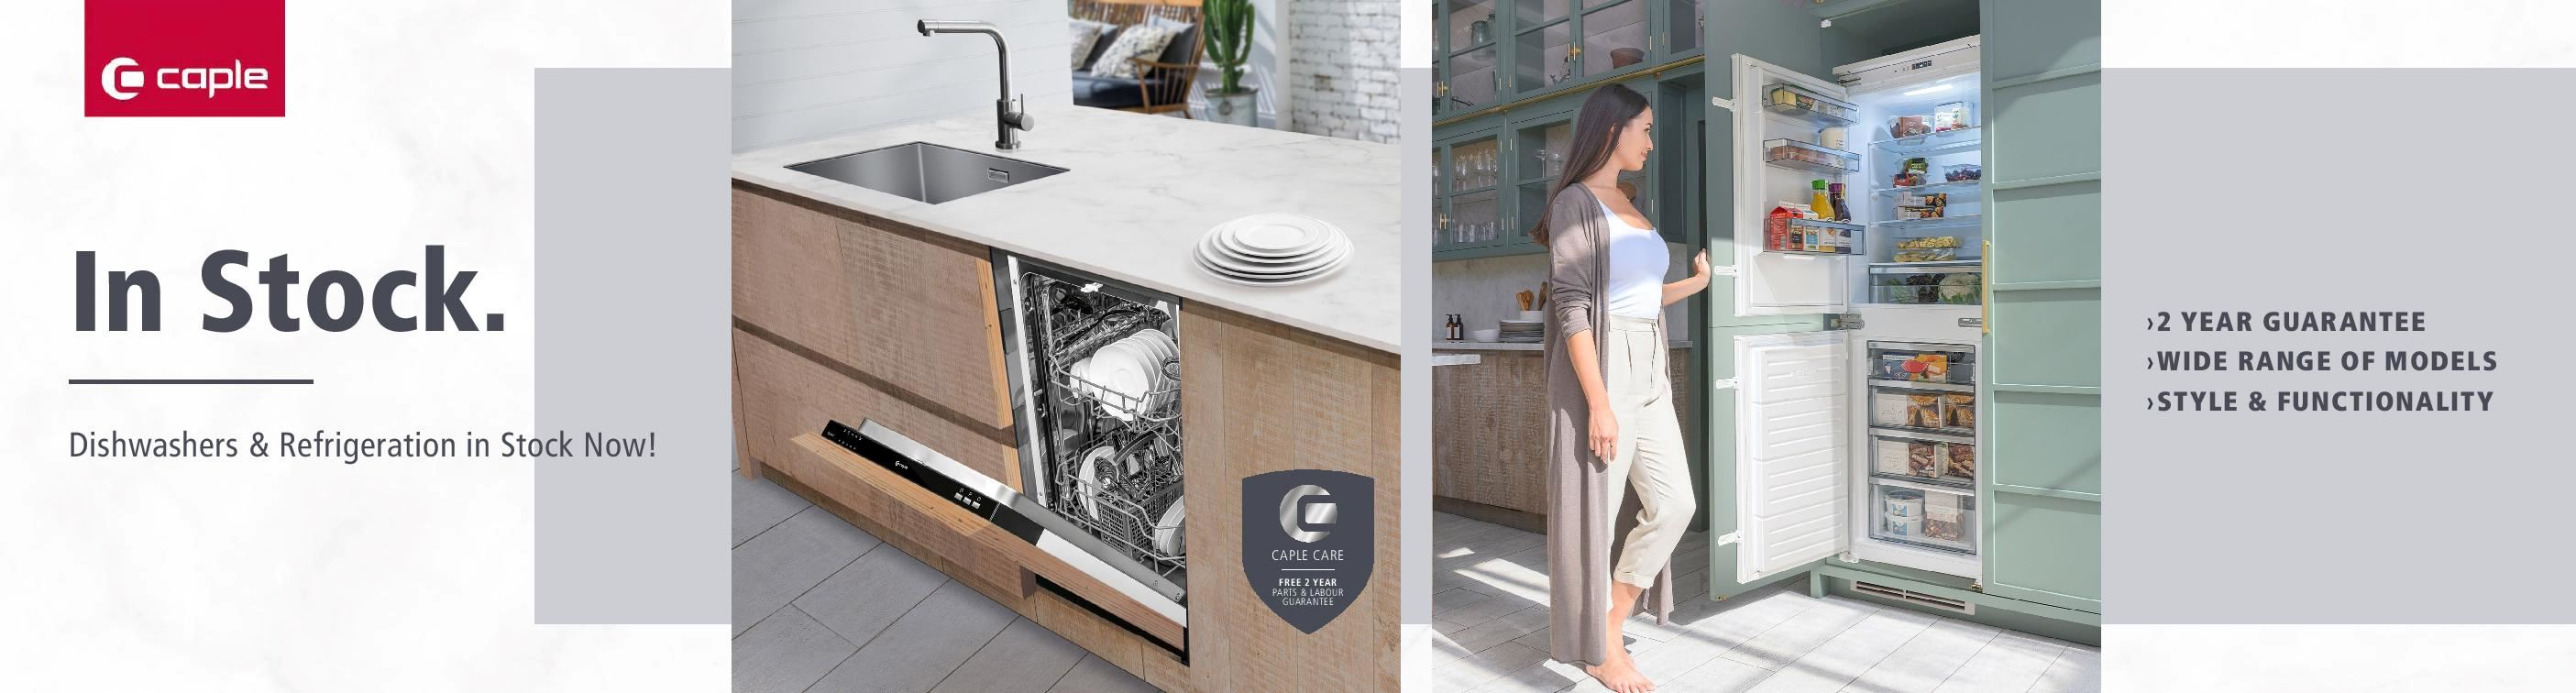 Caple Dishwasher & Refrigeration Banner - June 2021